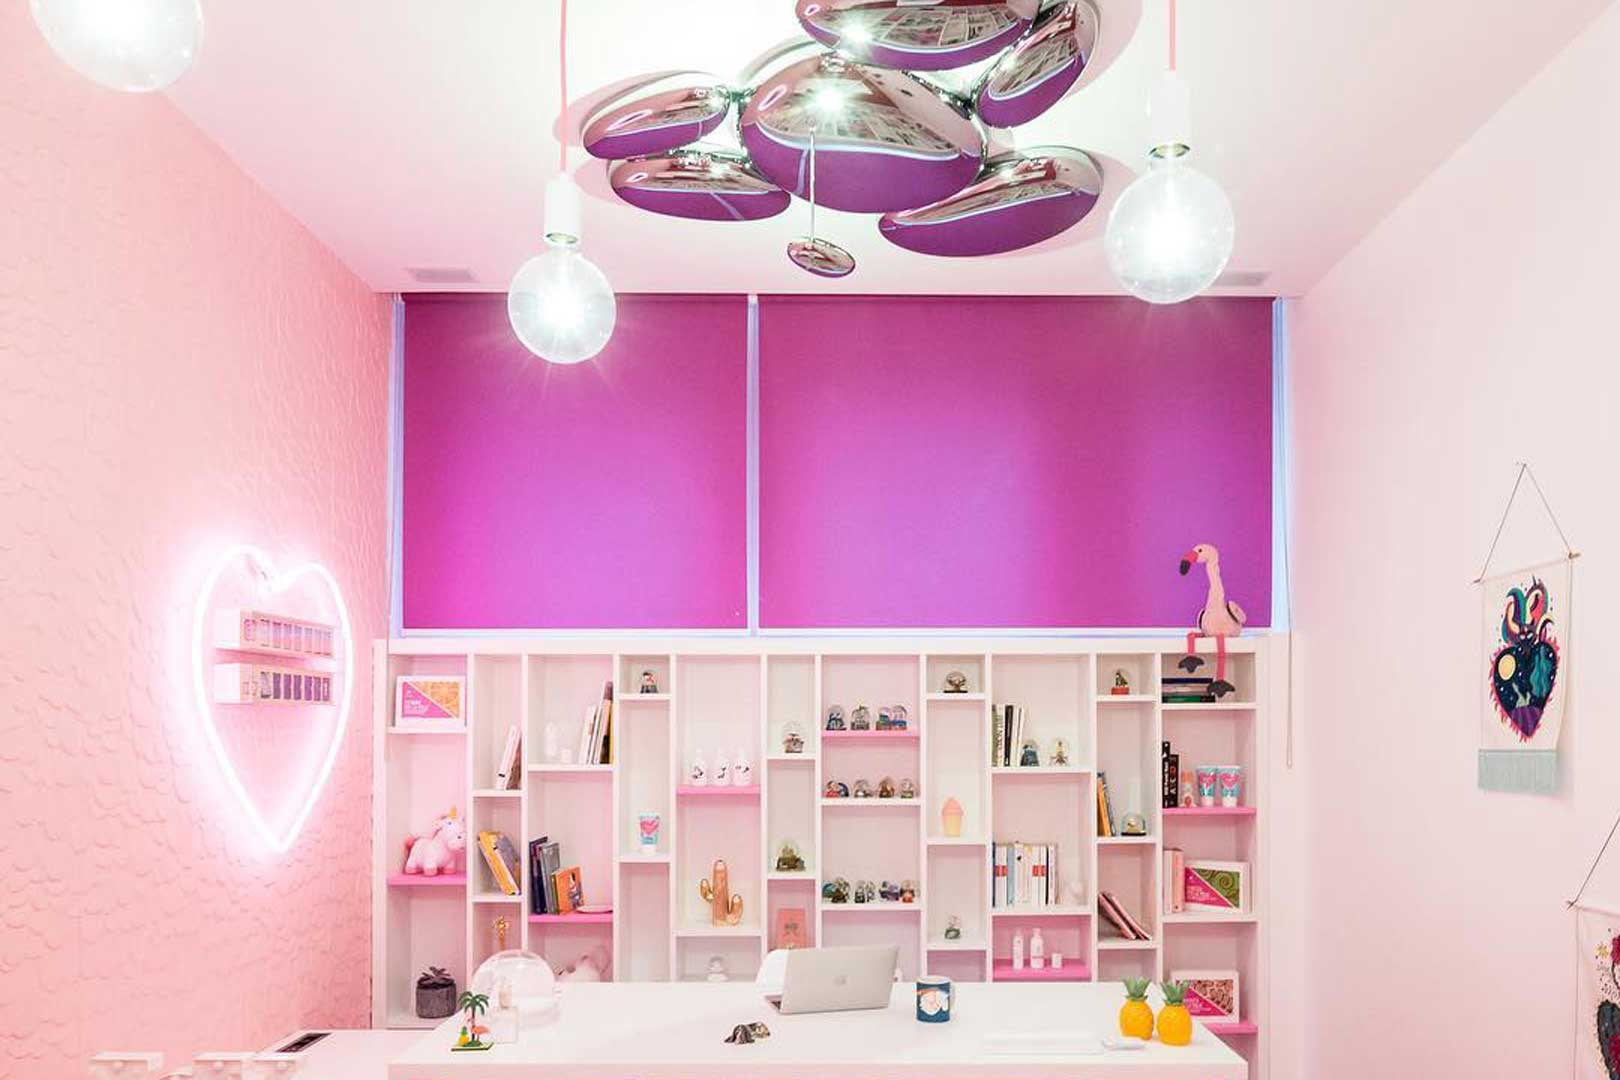 Bellavera Beautytherapy - Milano